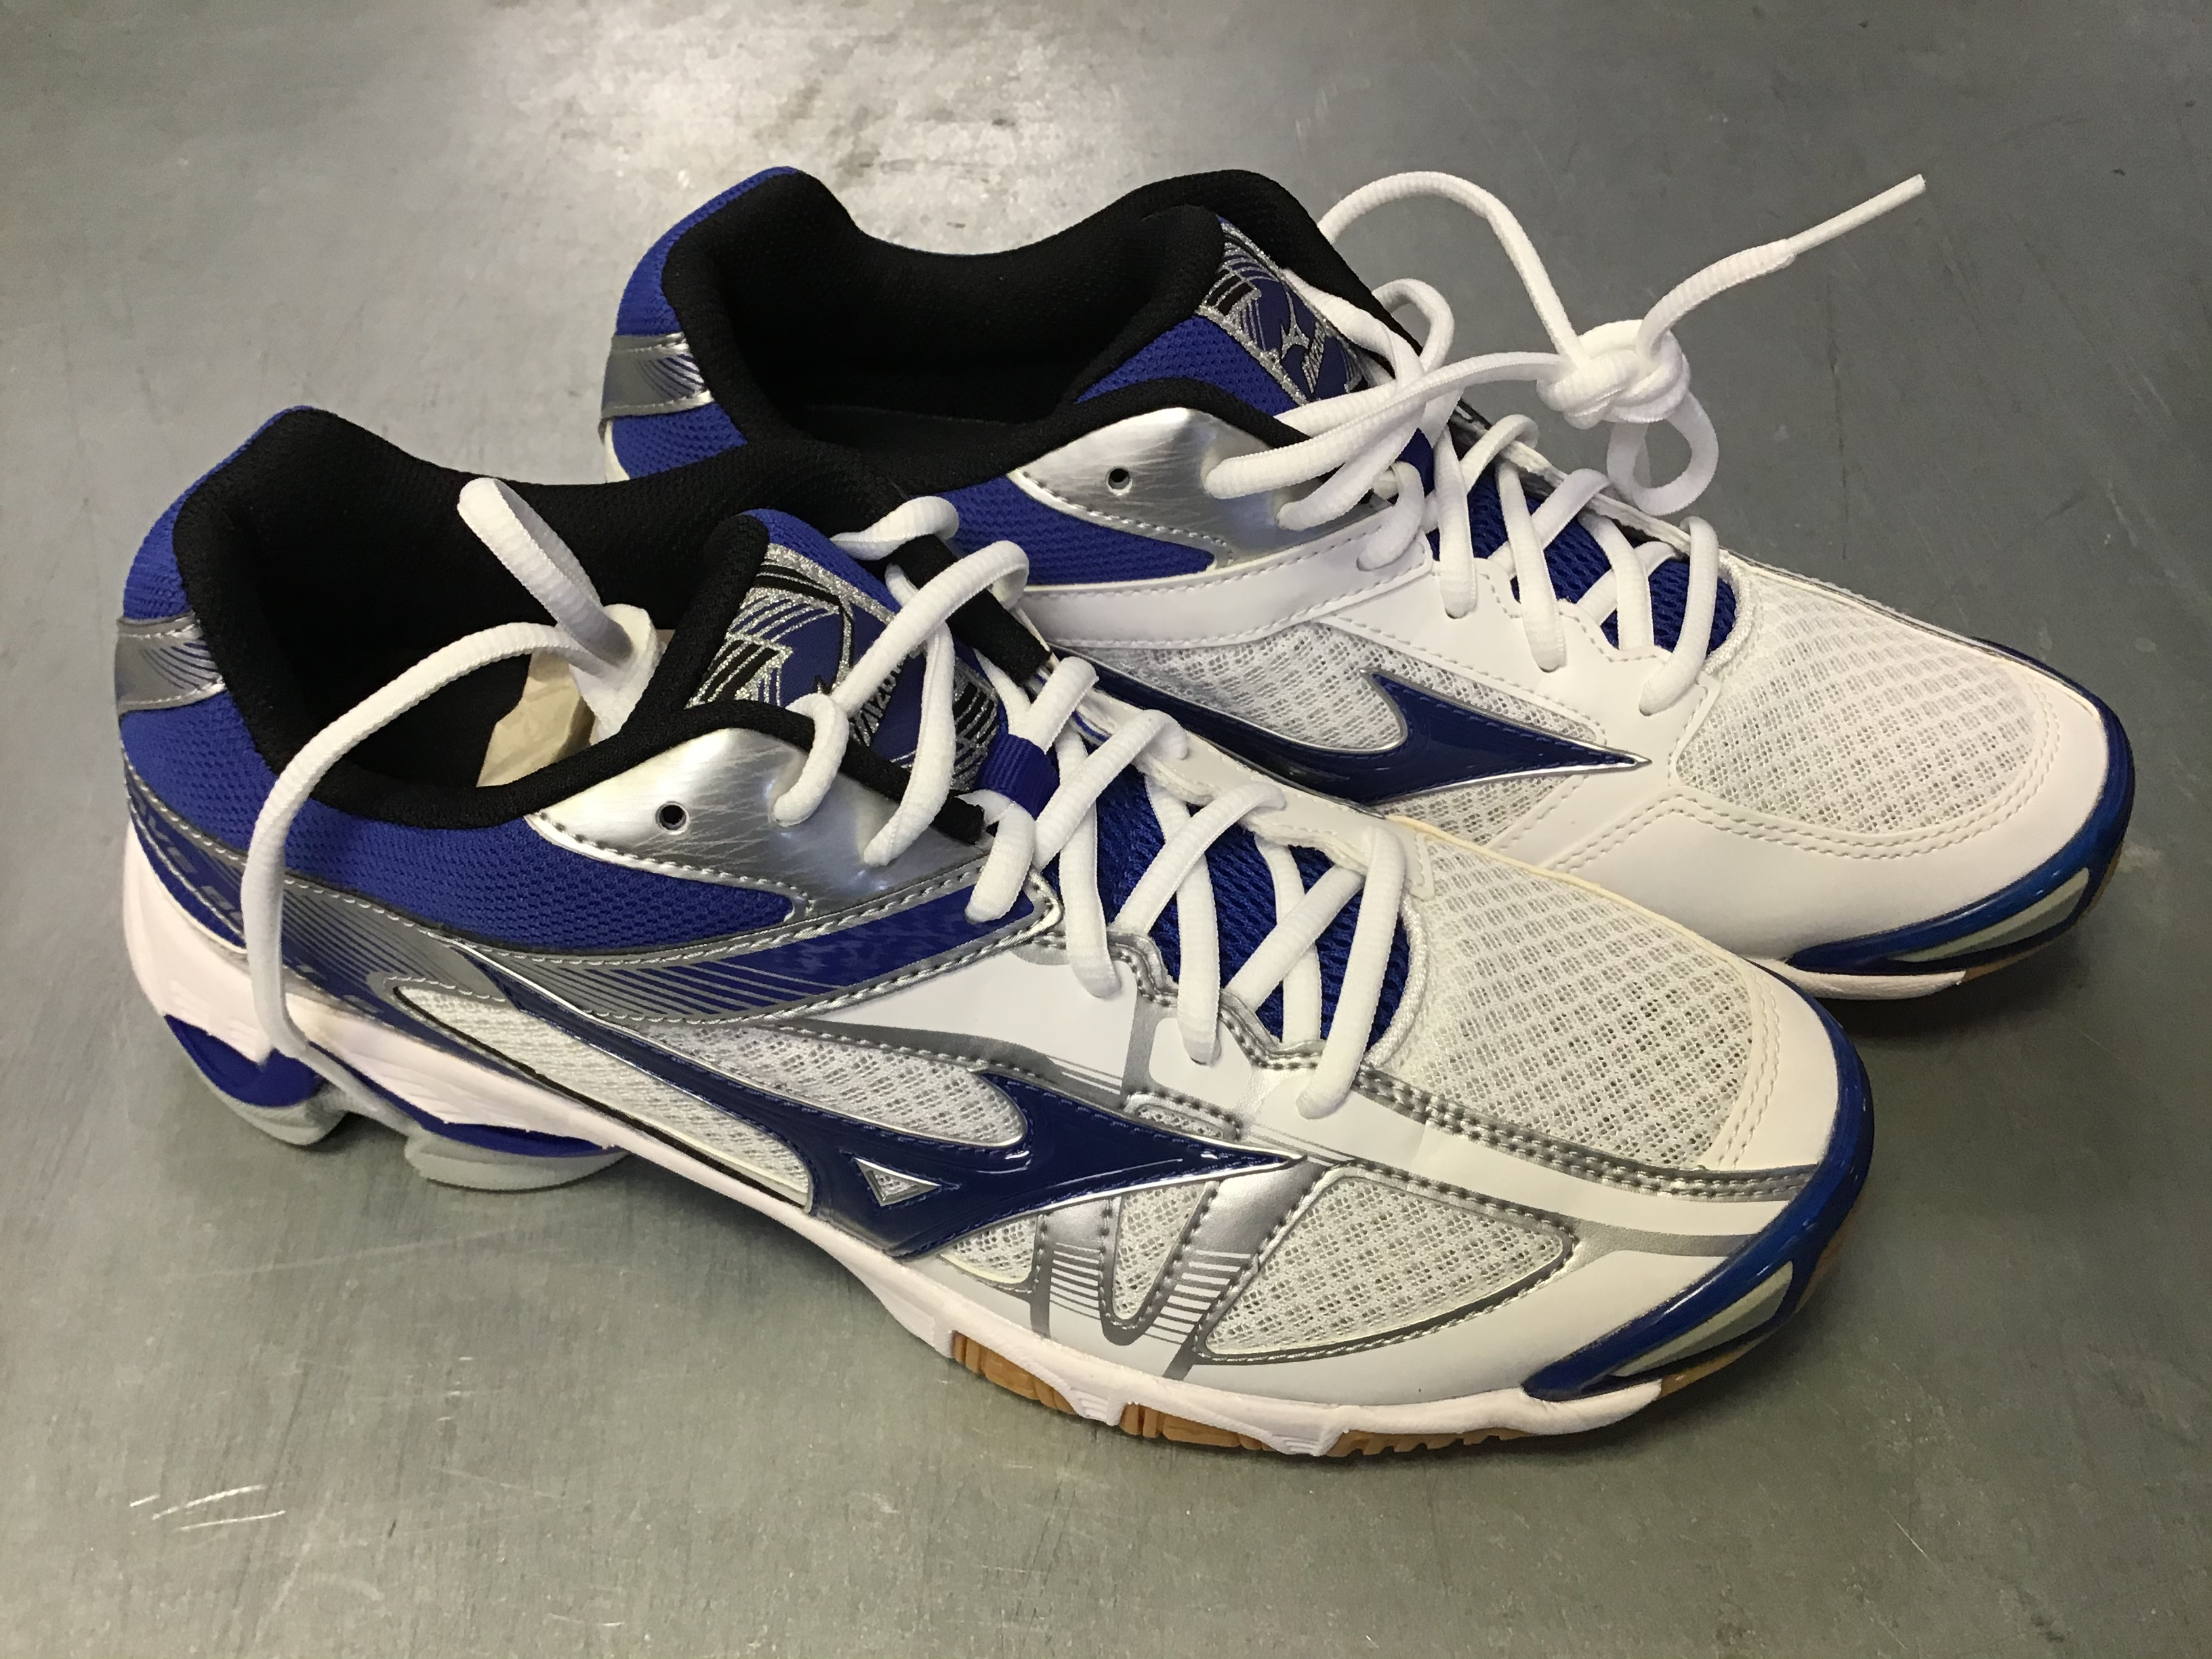 mizuno shoes usa volleyball usa indianapolis